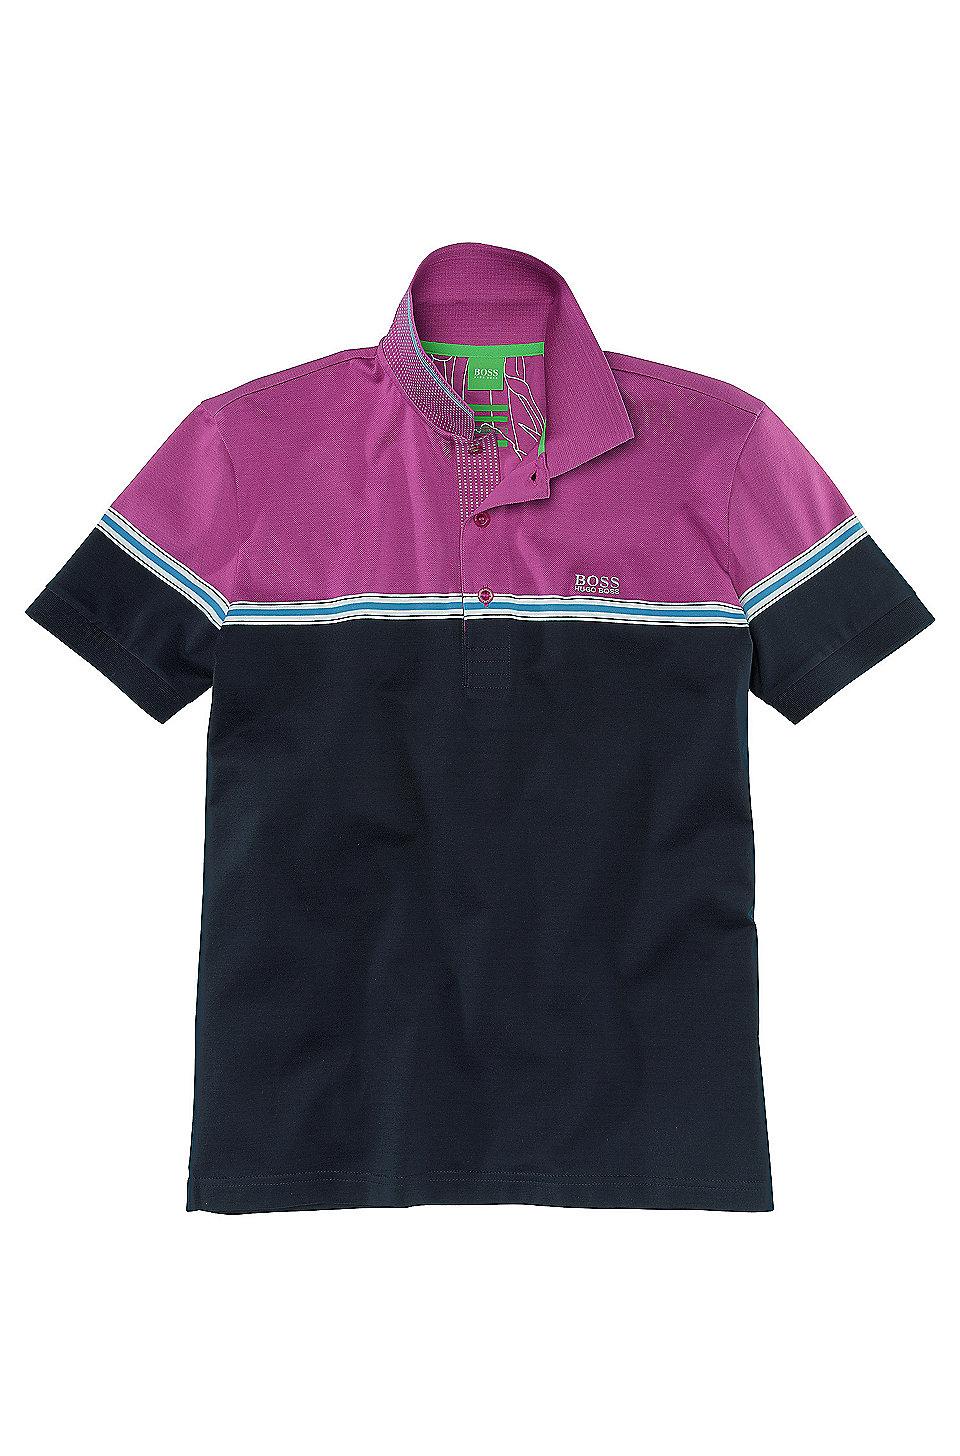 9faa8a0405a BOSS - Narrowly cut polo shirt 'Paddy 4'